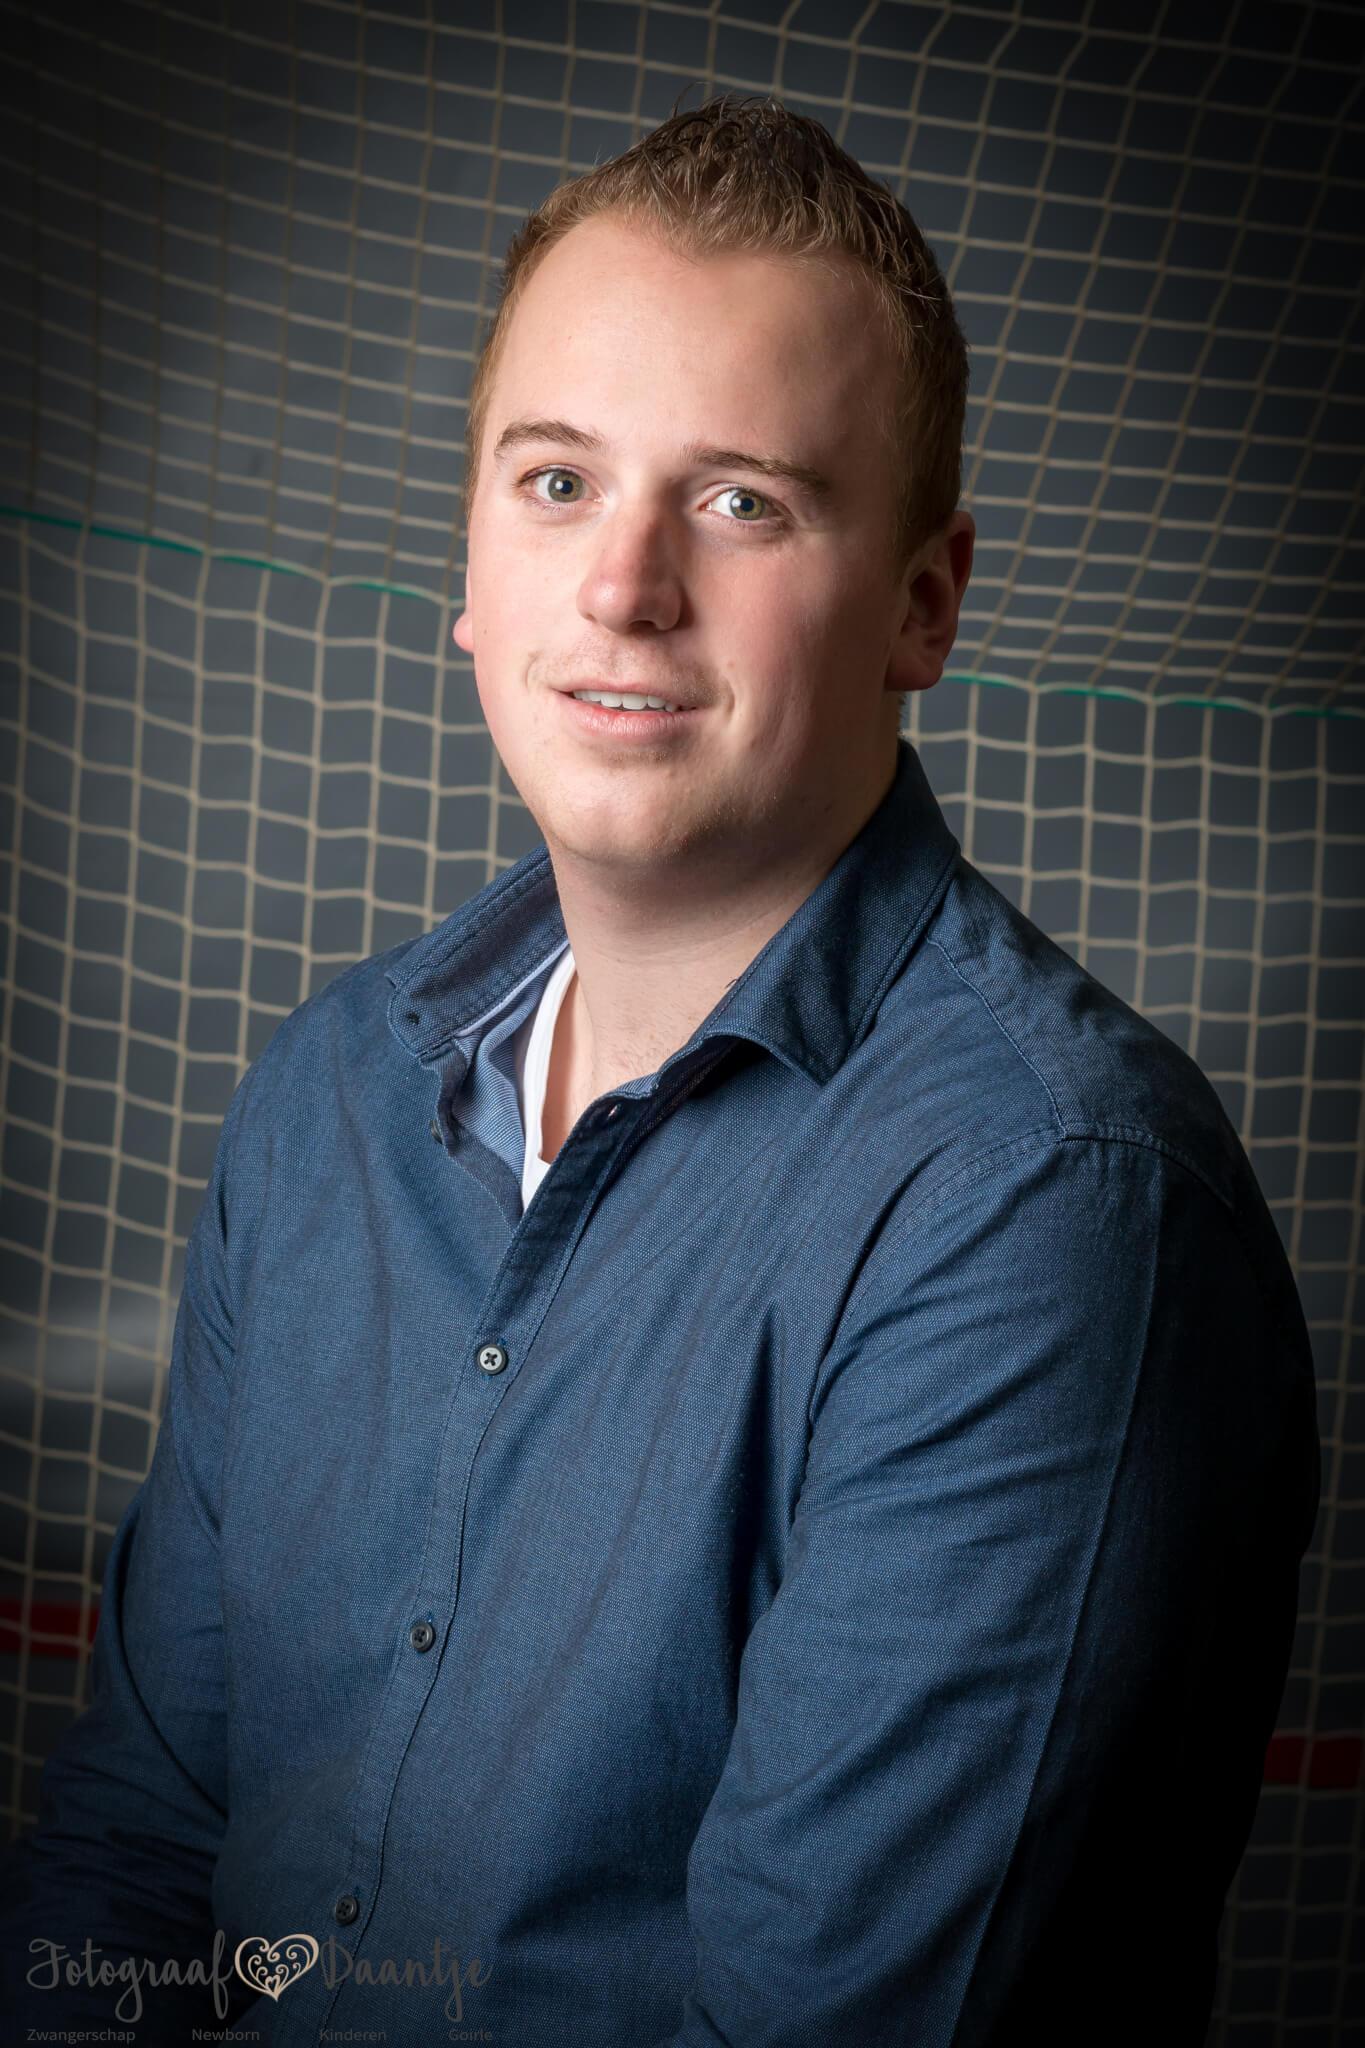 Mike van der Weide